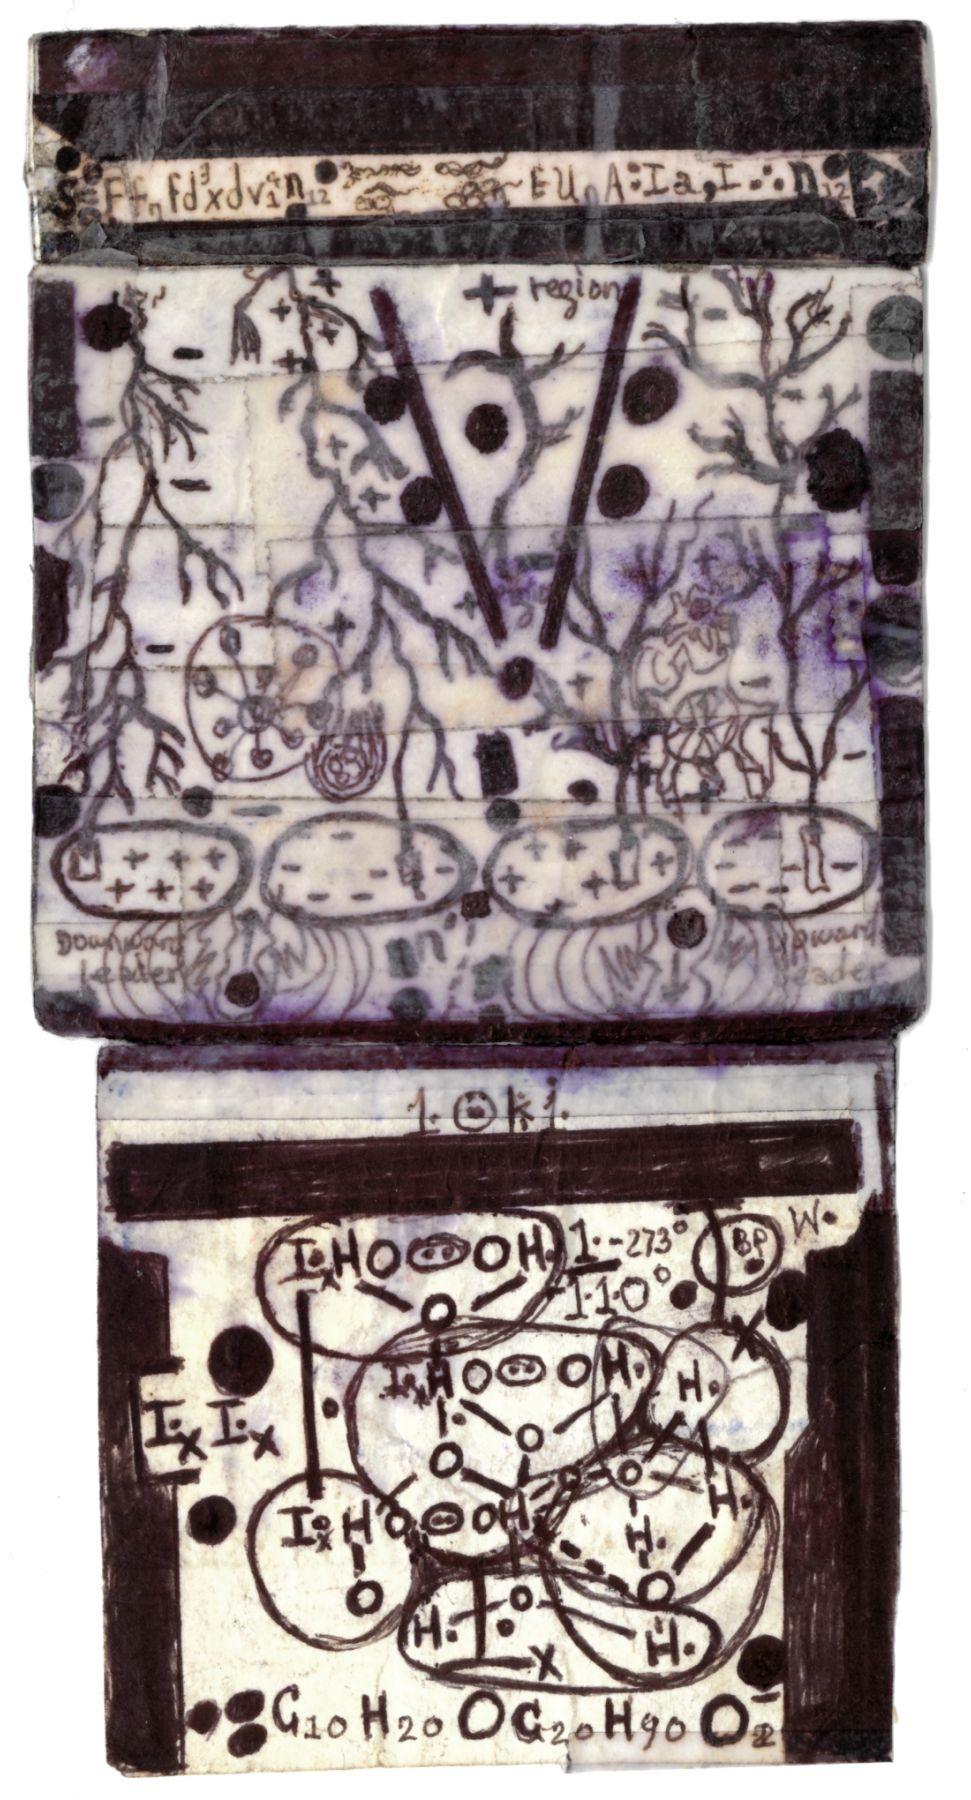 Mooselene,c. 2011, Ballpoint pen on paper with Scotch tape